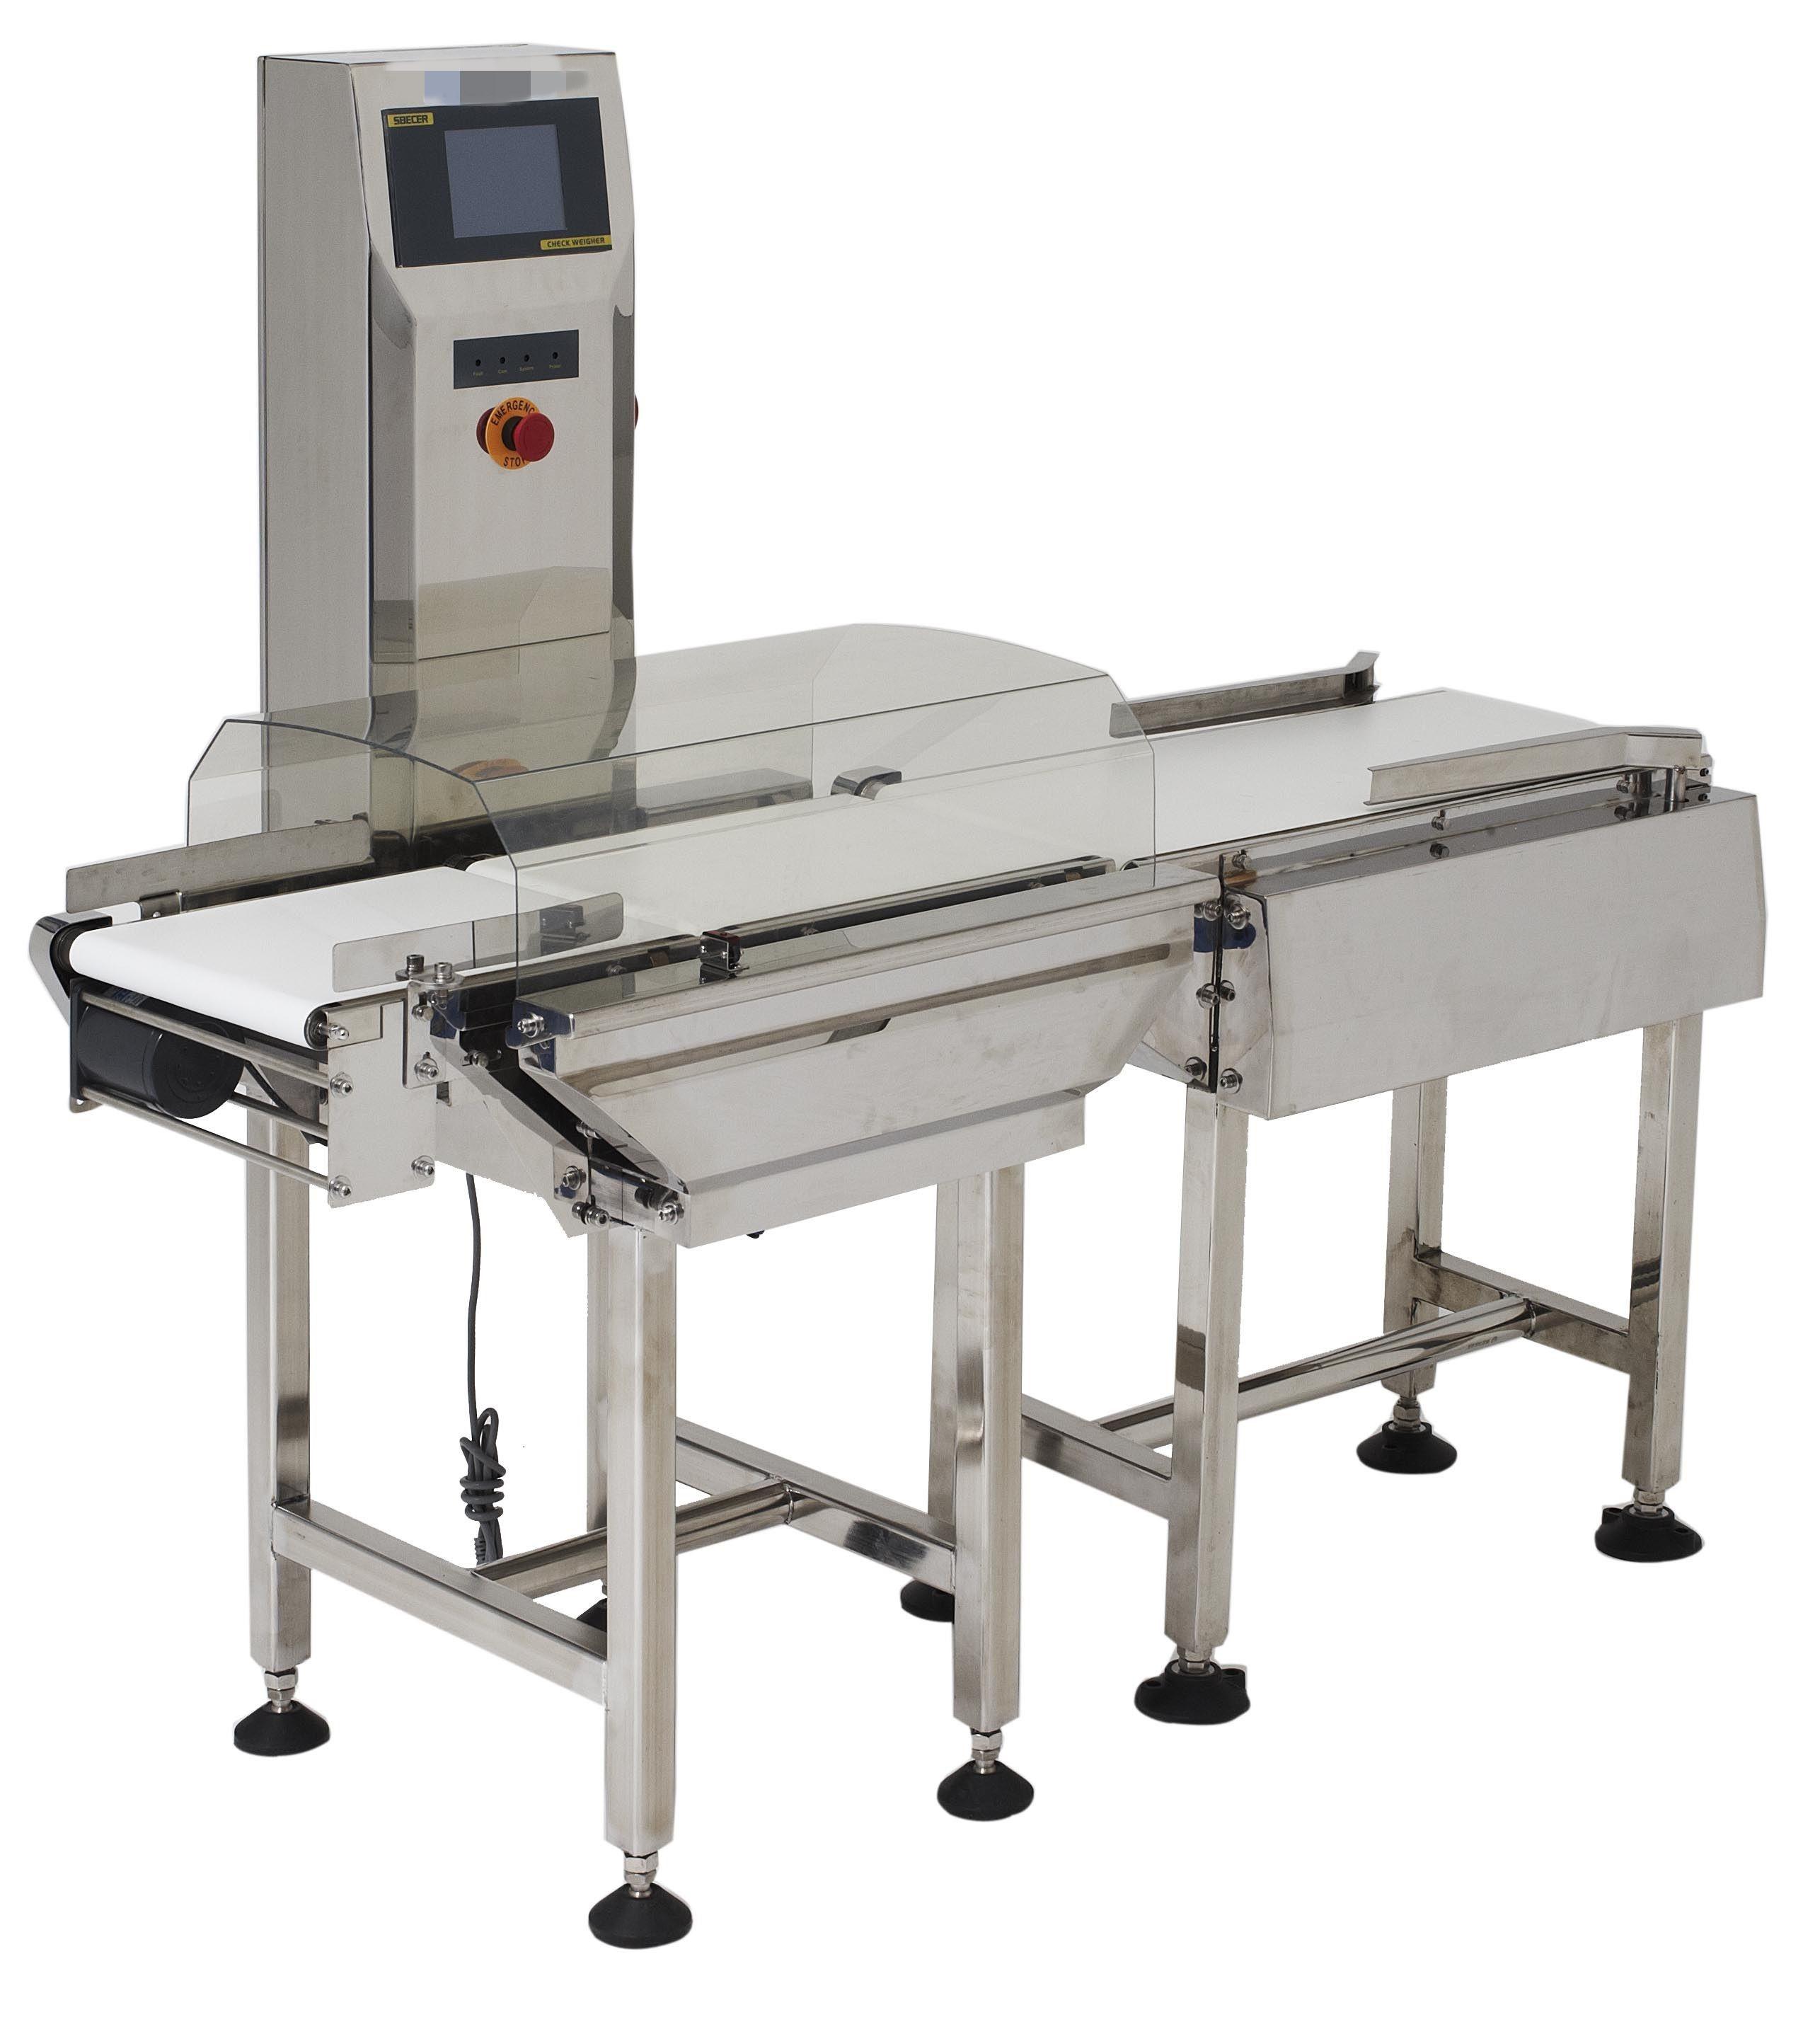 Kooyle Metal detector machine x ray system check weighing machine